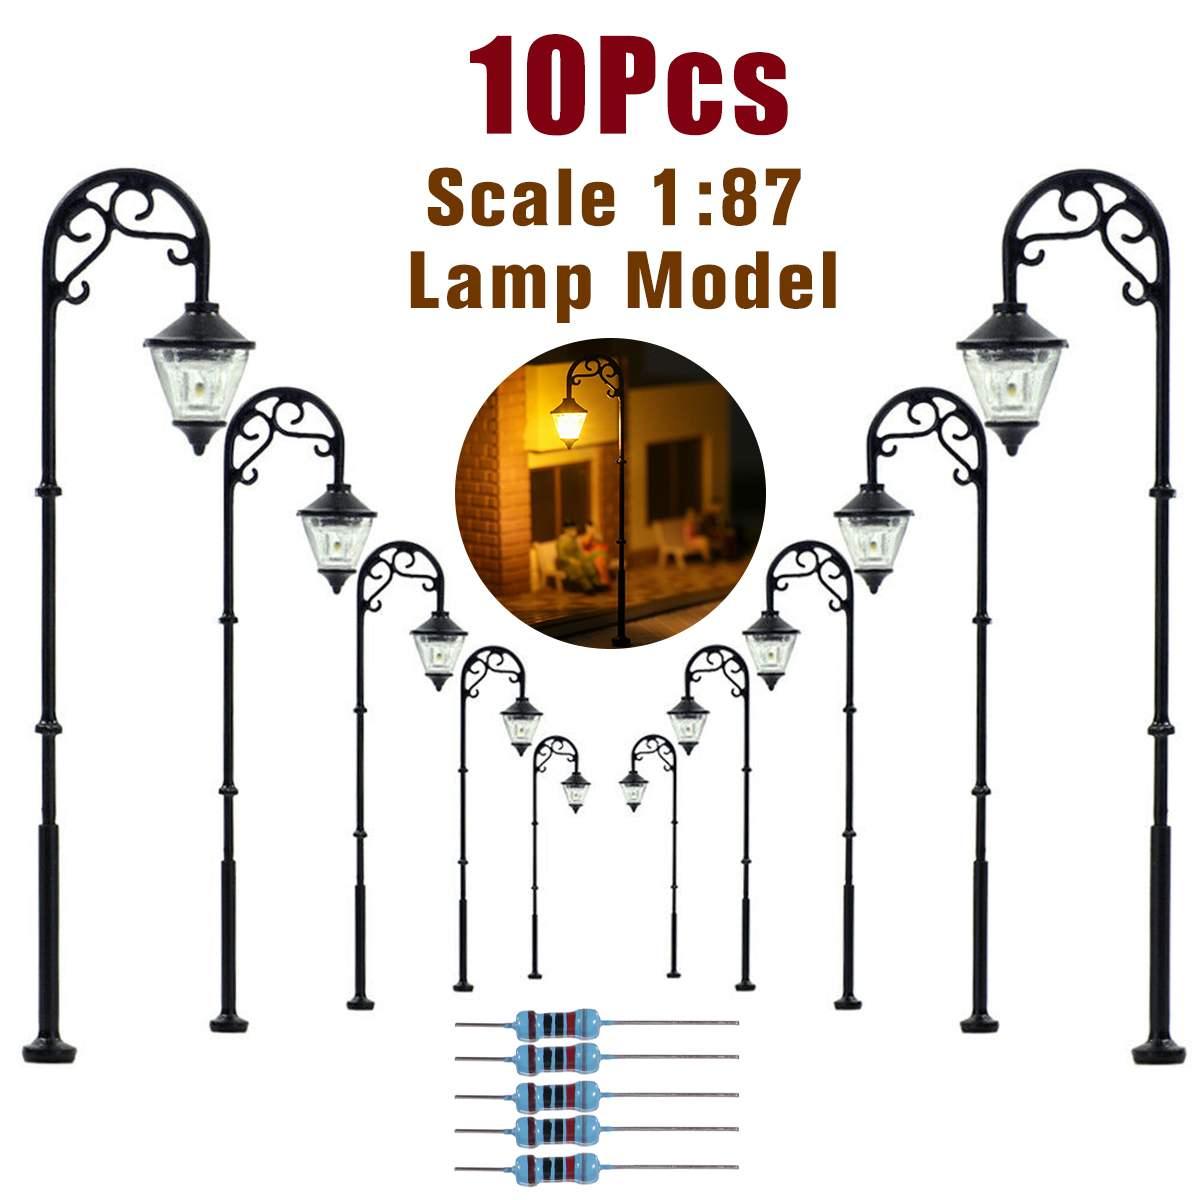 10 stücke 187 HO Skala Retro Modell Straße Lampe Layout Laternenpfahl Garten Landschaft Licht Eisenbahn Zug Lampe Micro Landschaft Decor